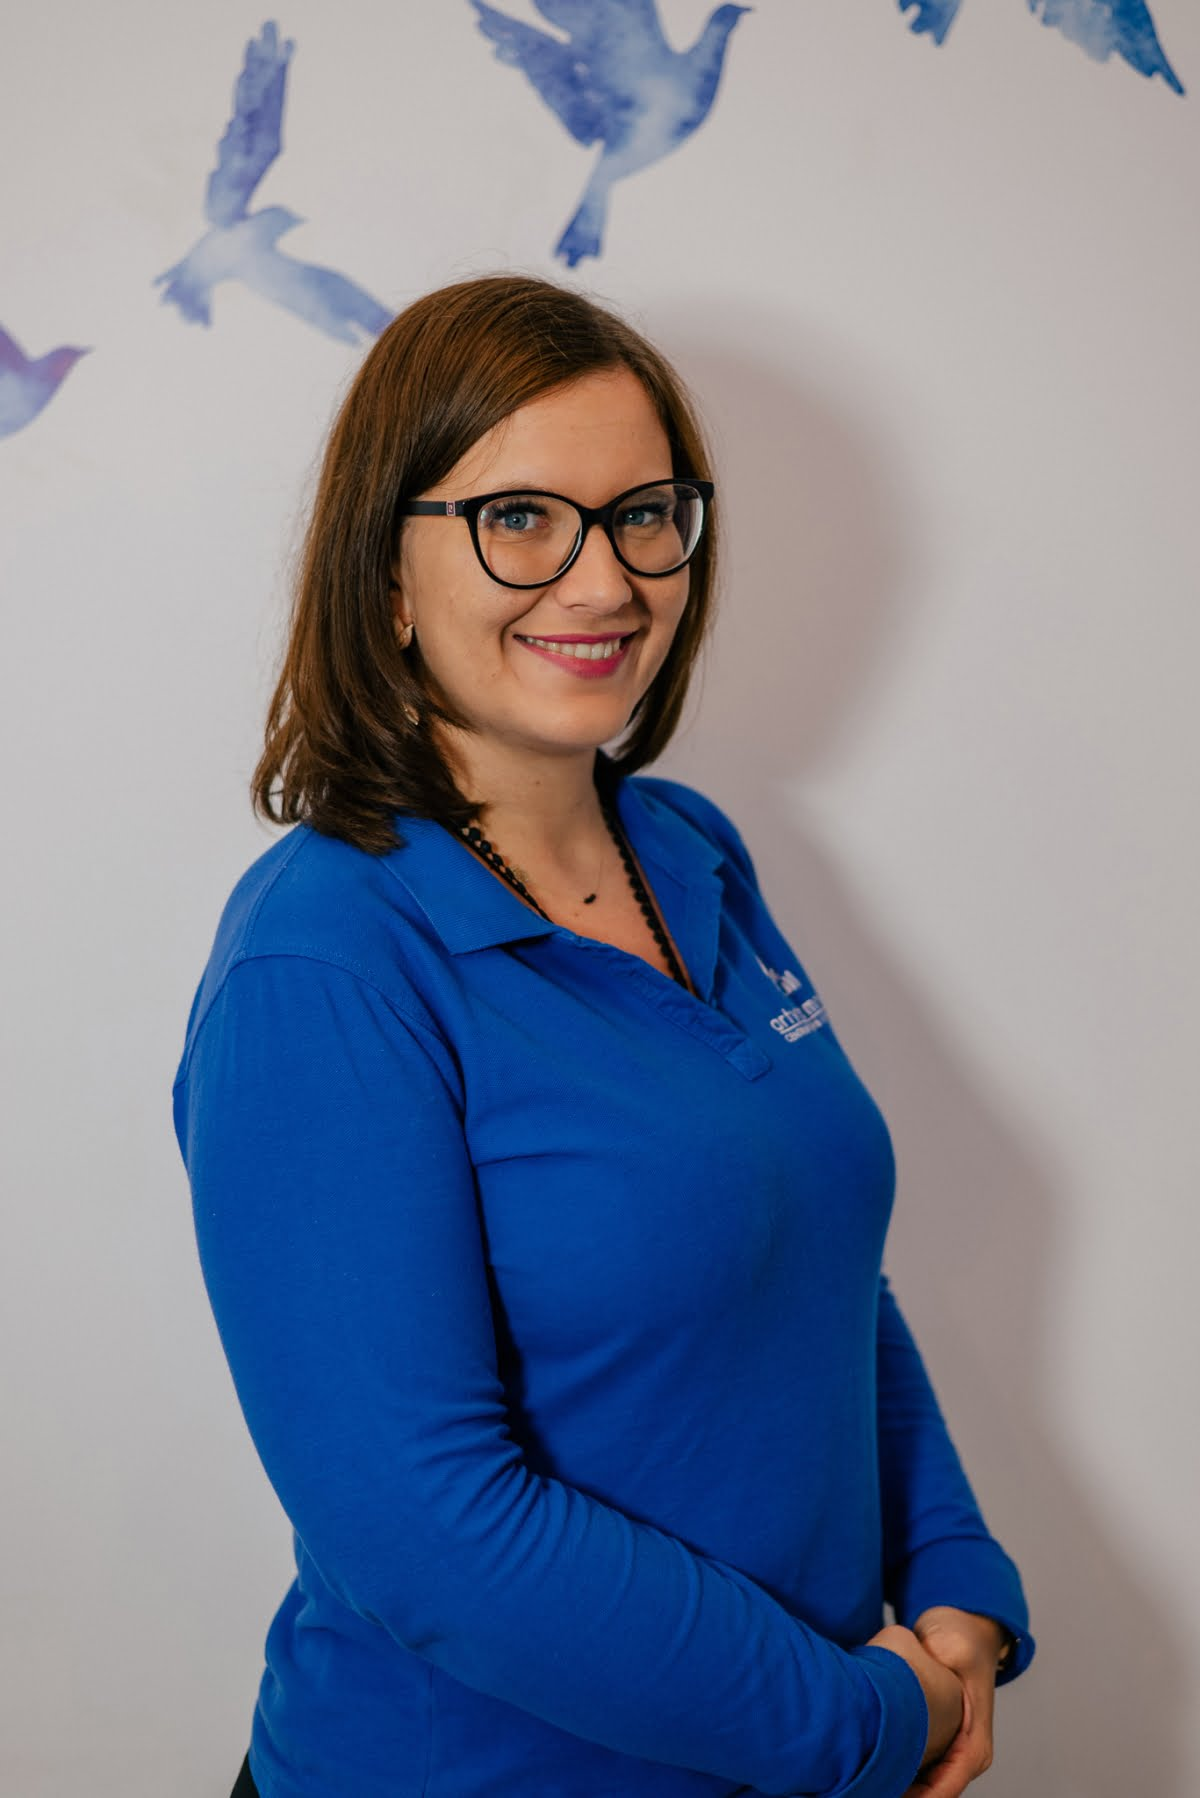 Aleksandra Jastrzębowska-Jasińska